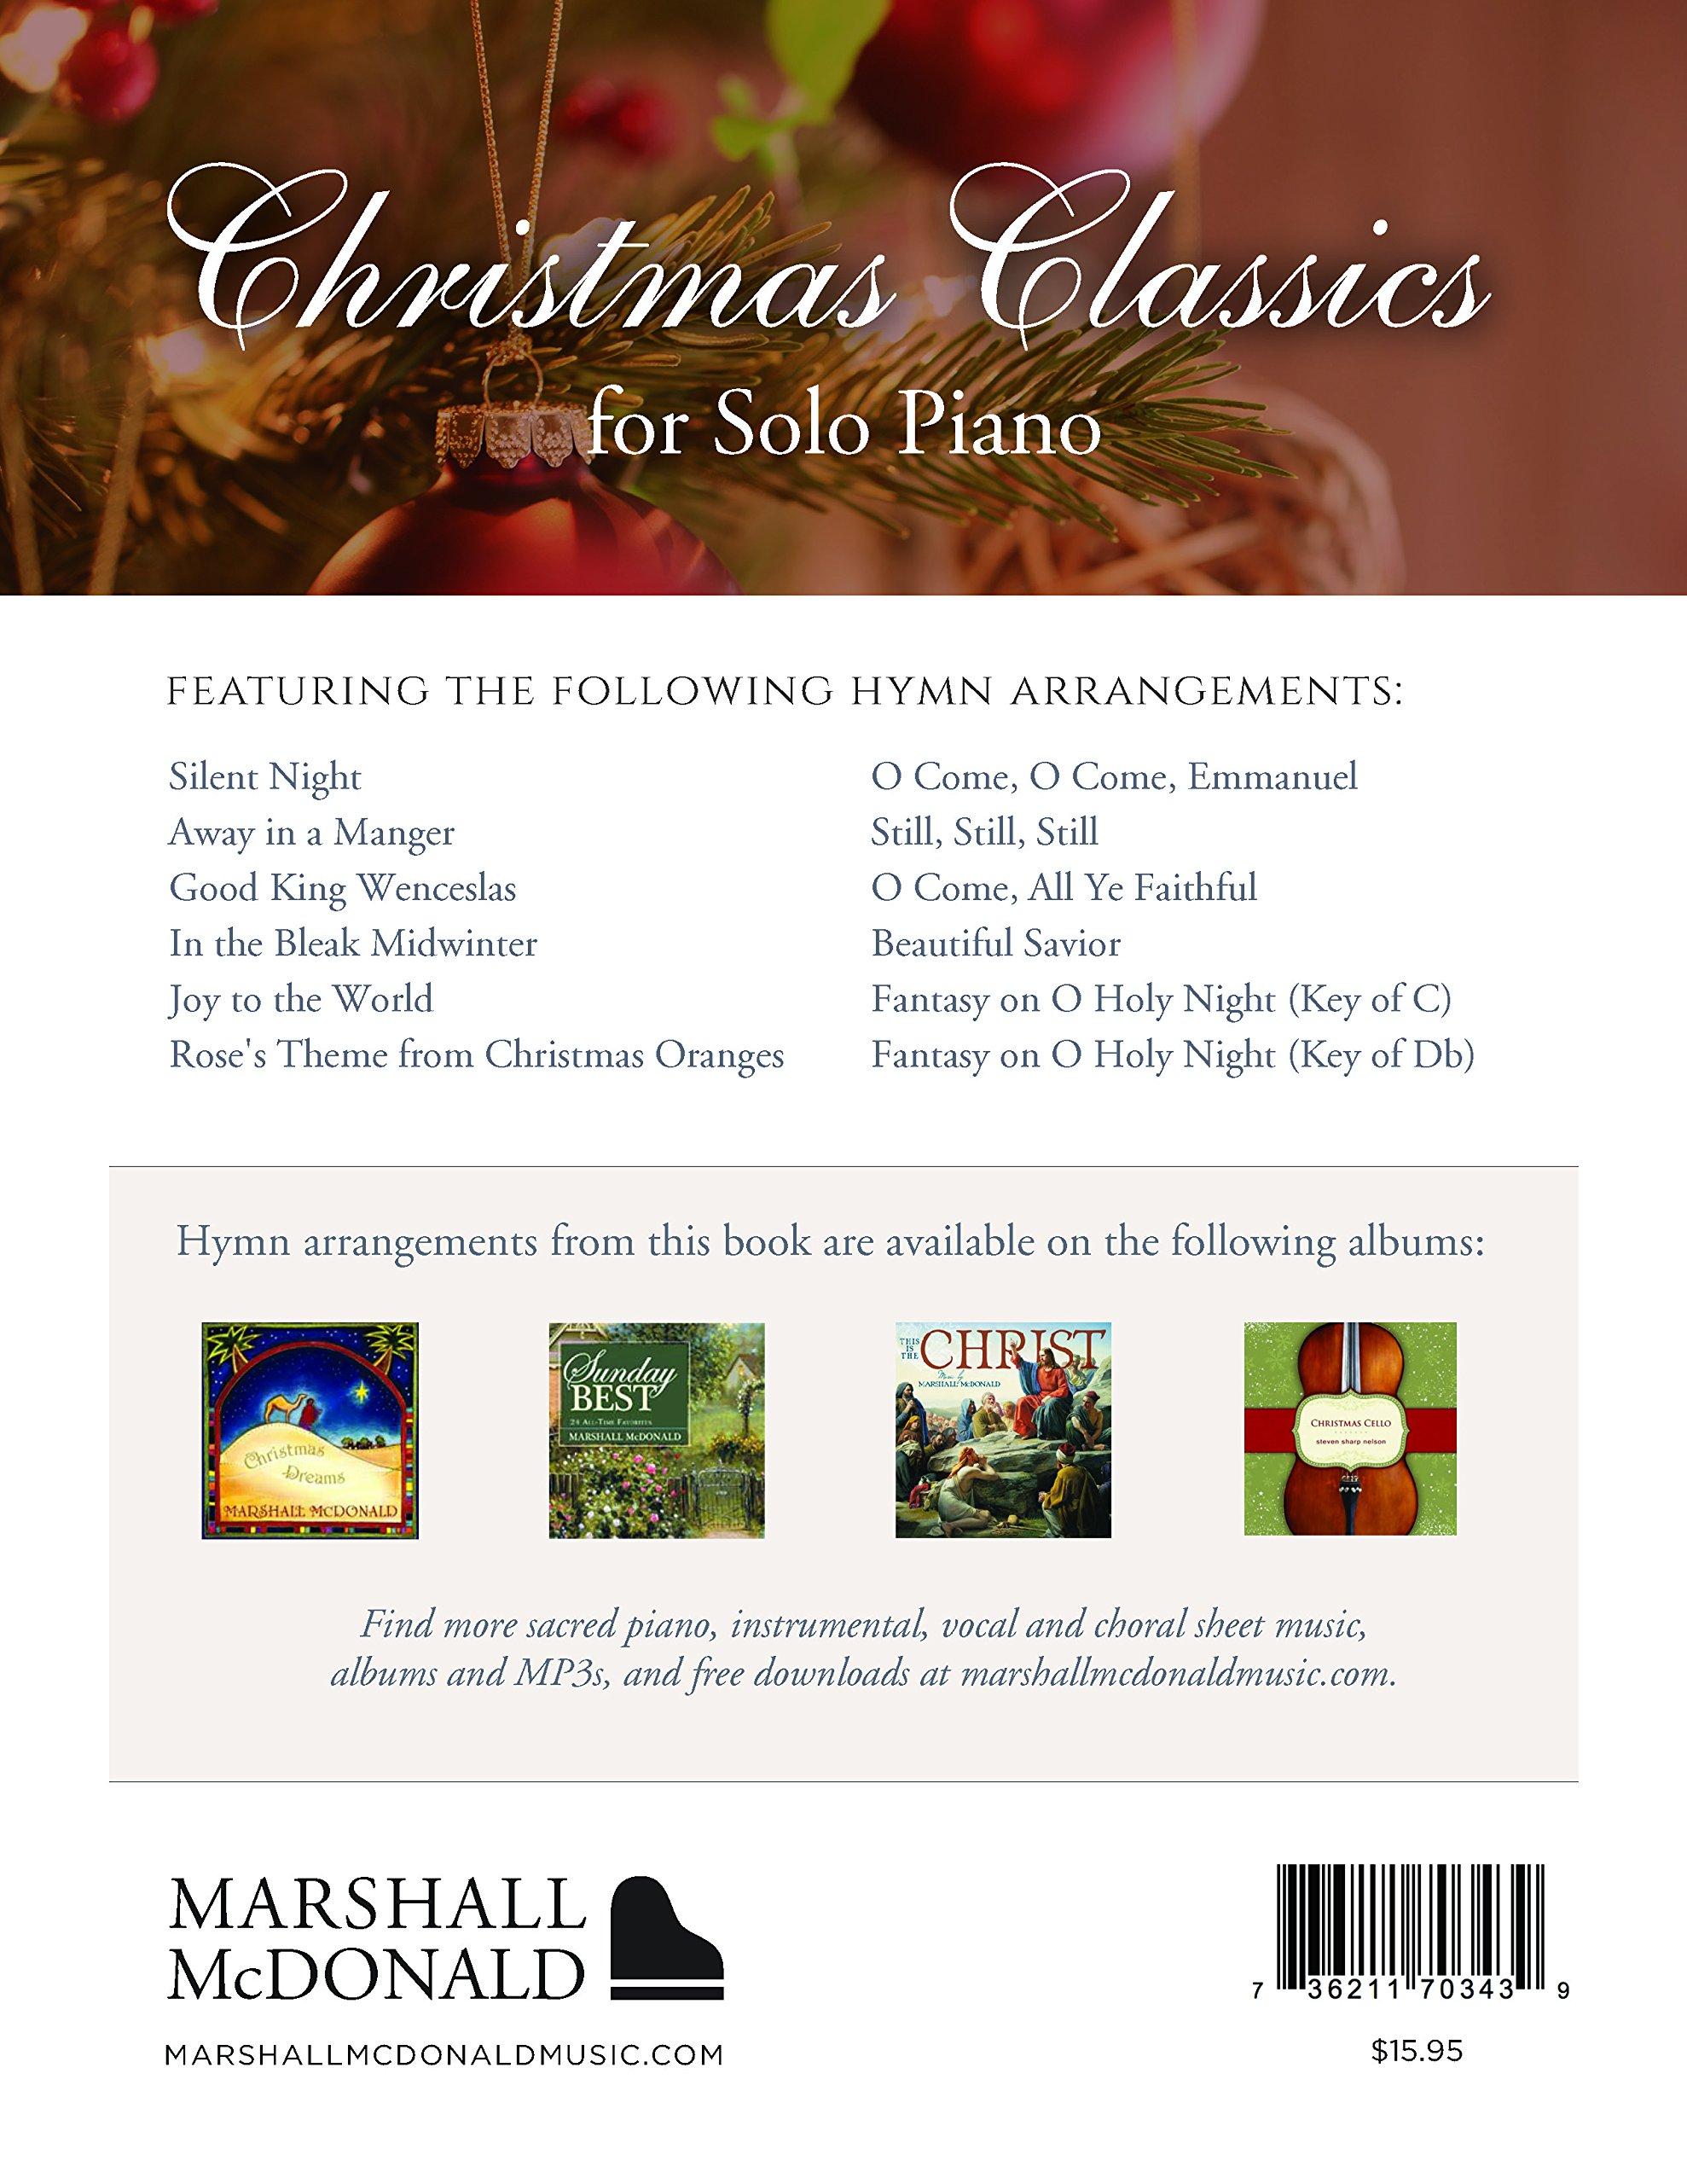 Christmas Classics: Marshall McDonald: 0736211703439: Amazon.com: Books